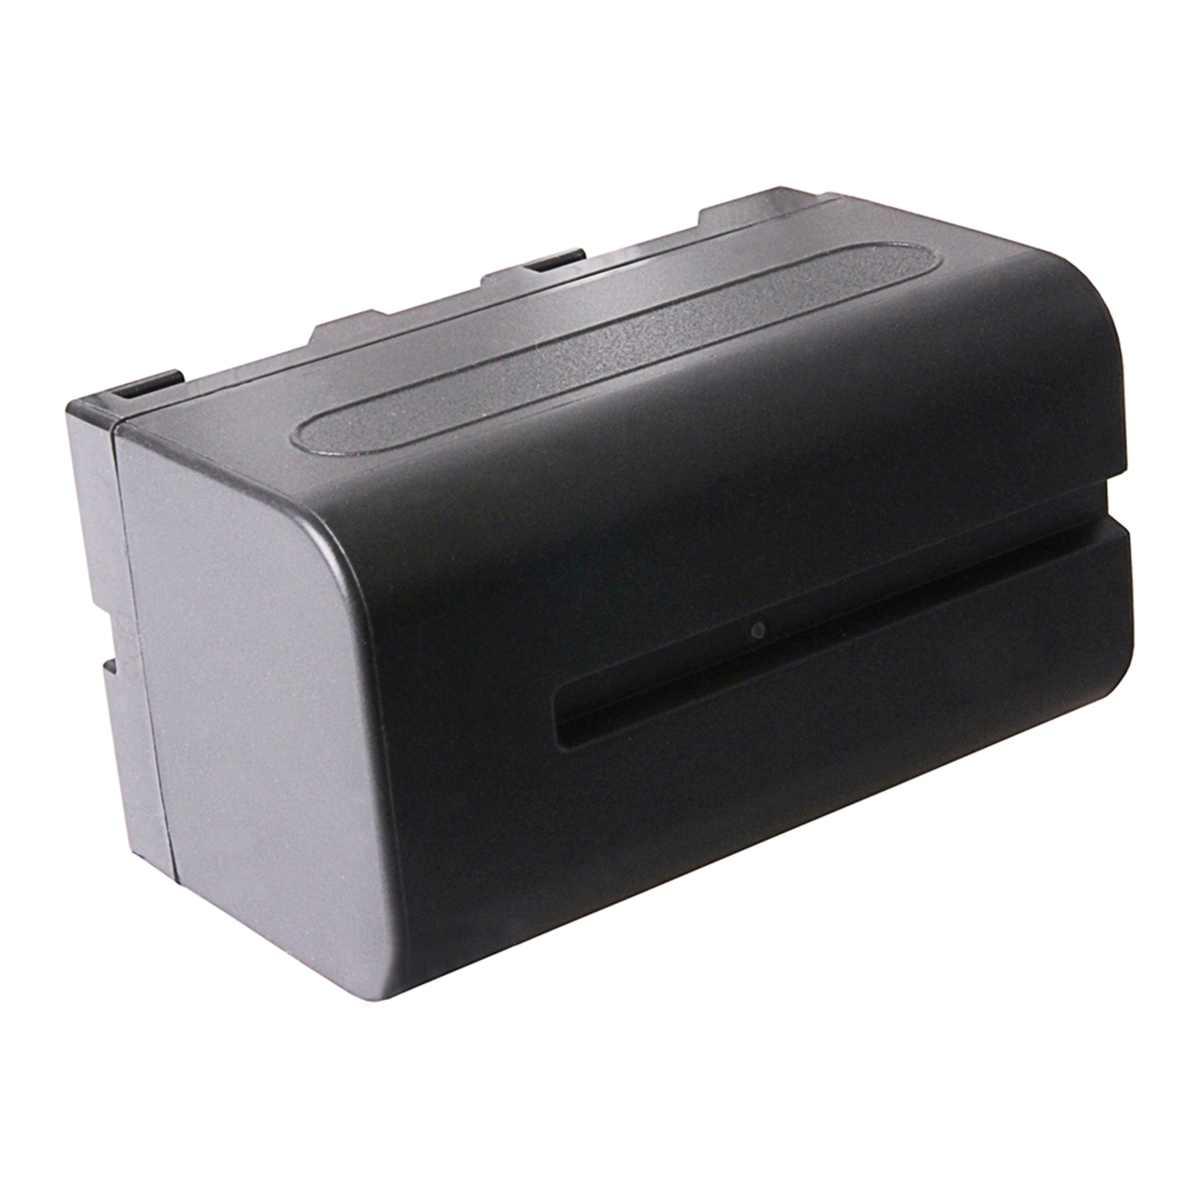 NP-F 750 Li-Ion Battery for Sony, 4400mAh